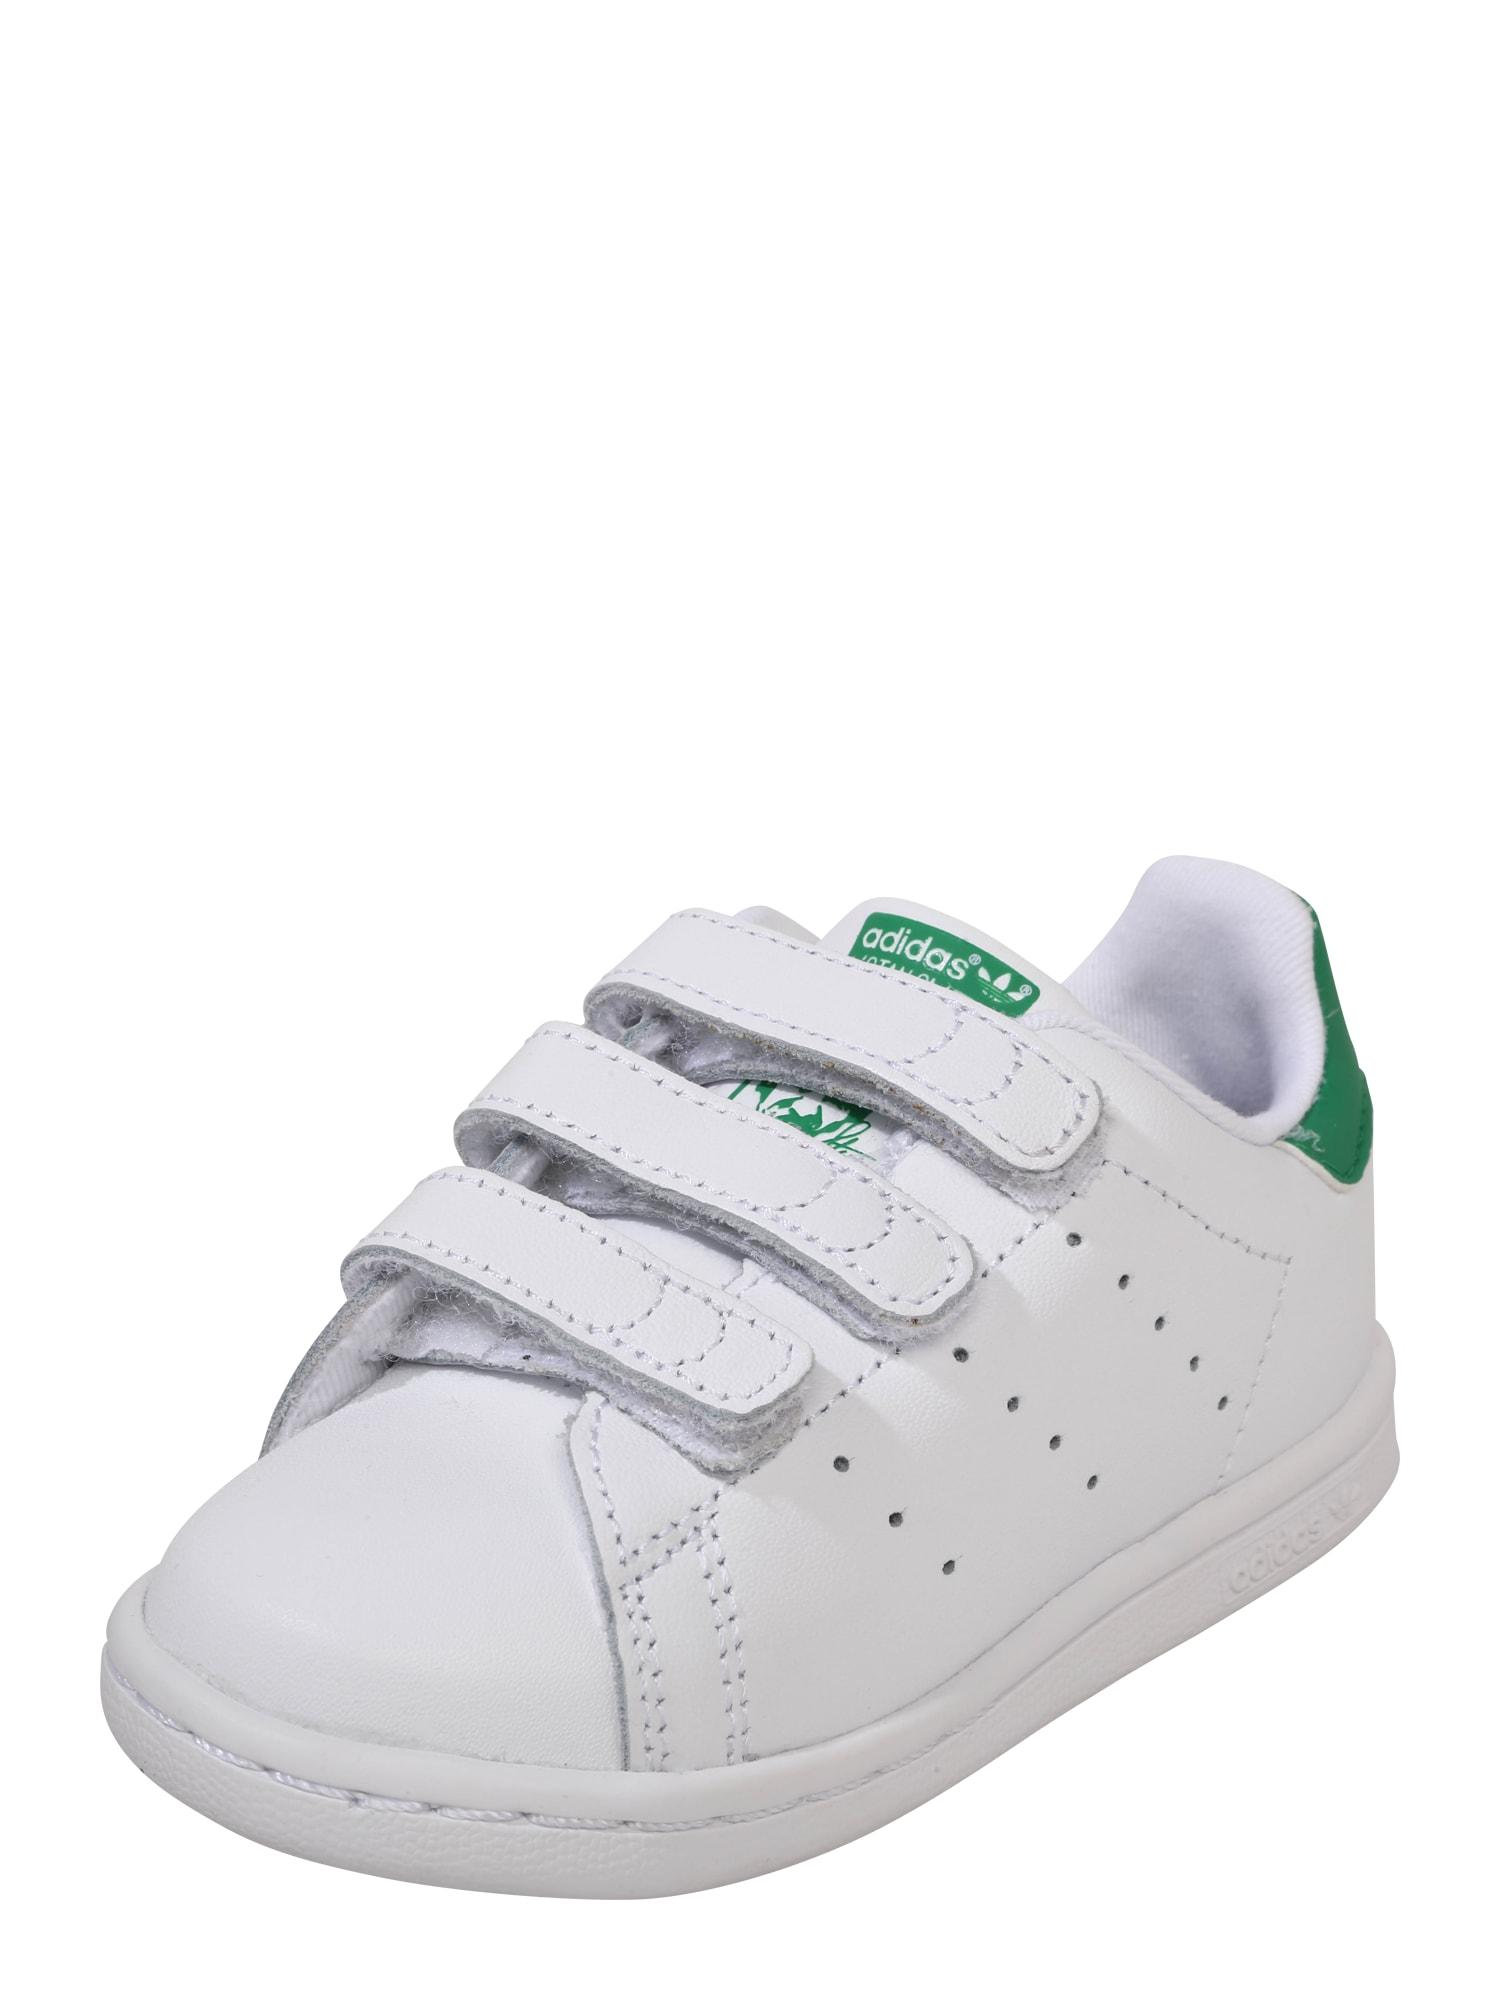 Tenisky STAN SMITH CF I zelená bílá ADIDAS ORIGINALS